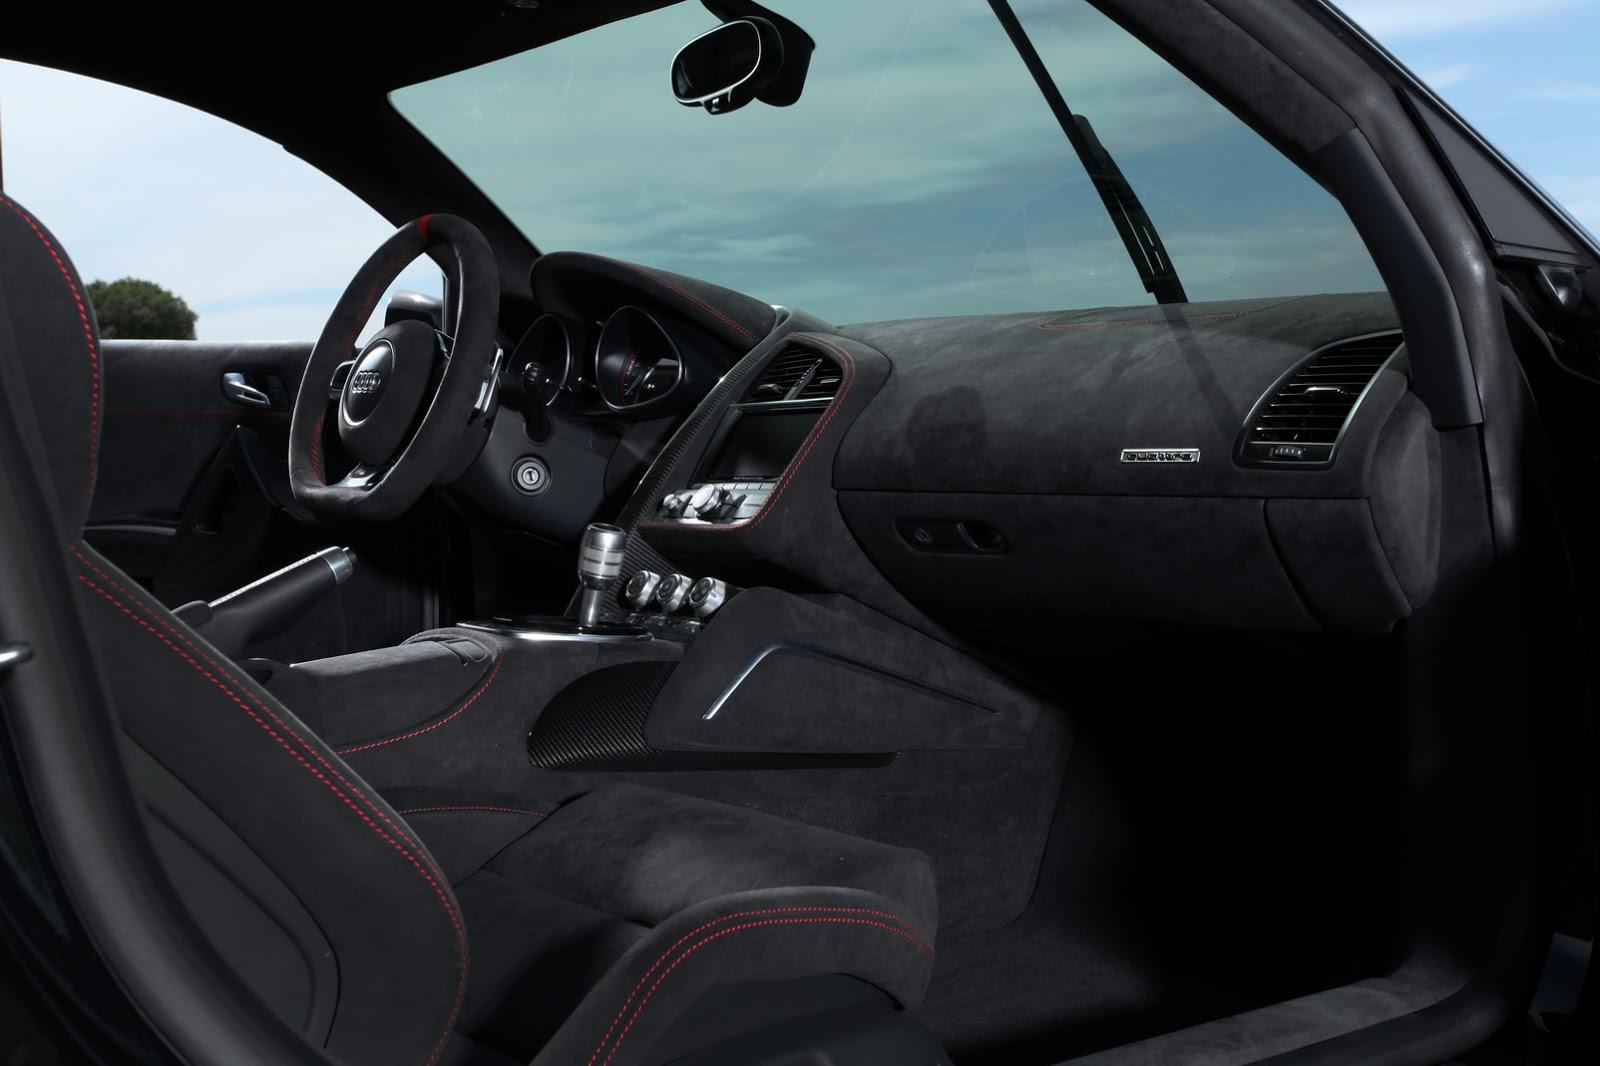 Audi-R8-Recon-MR8-17.jpg